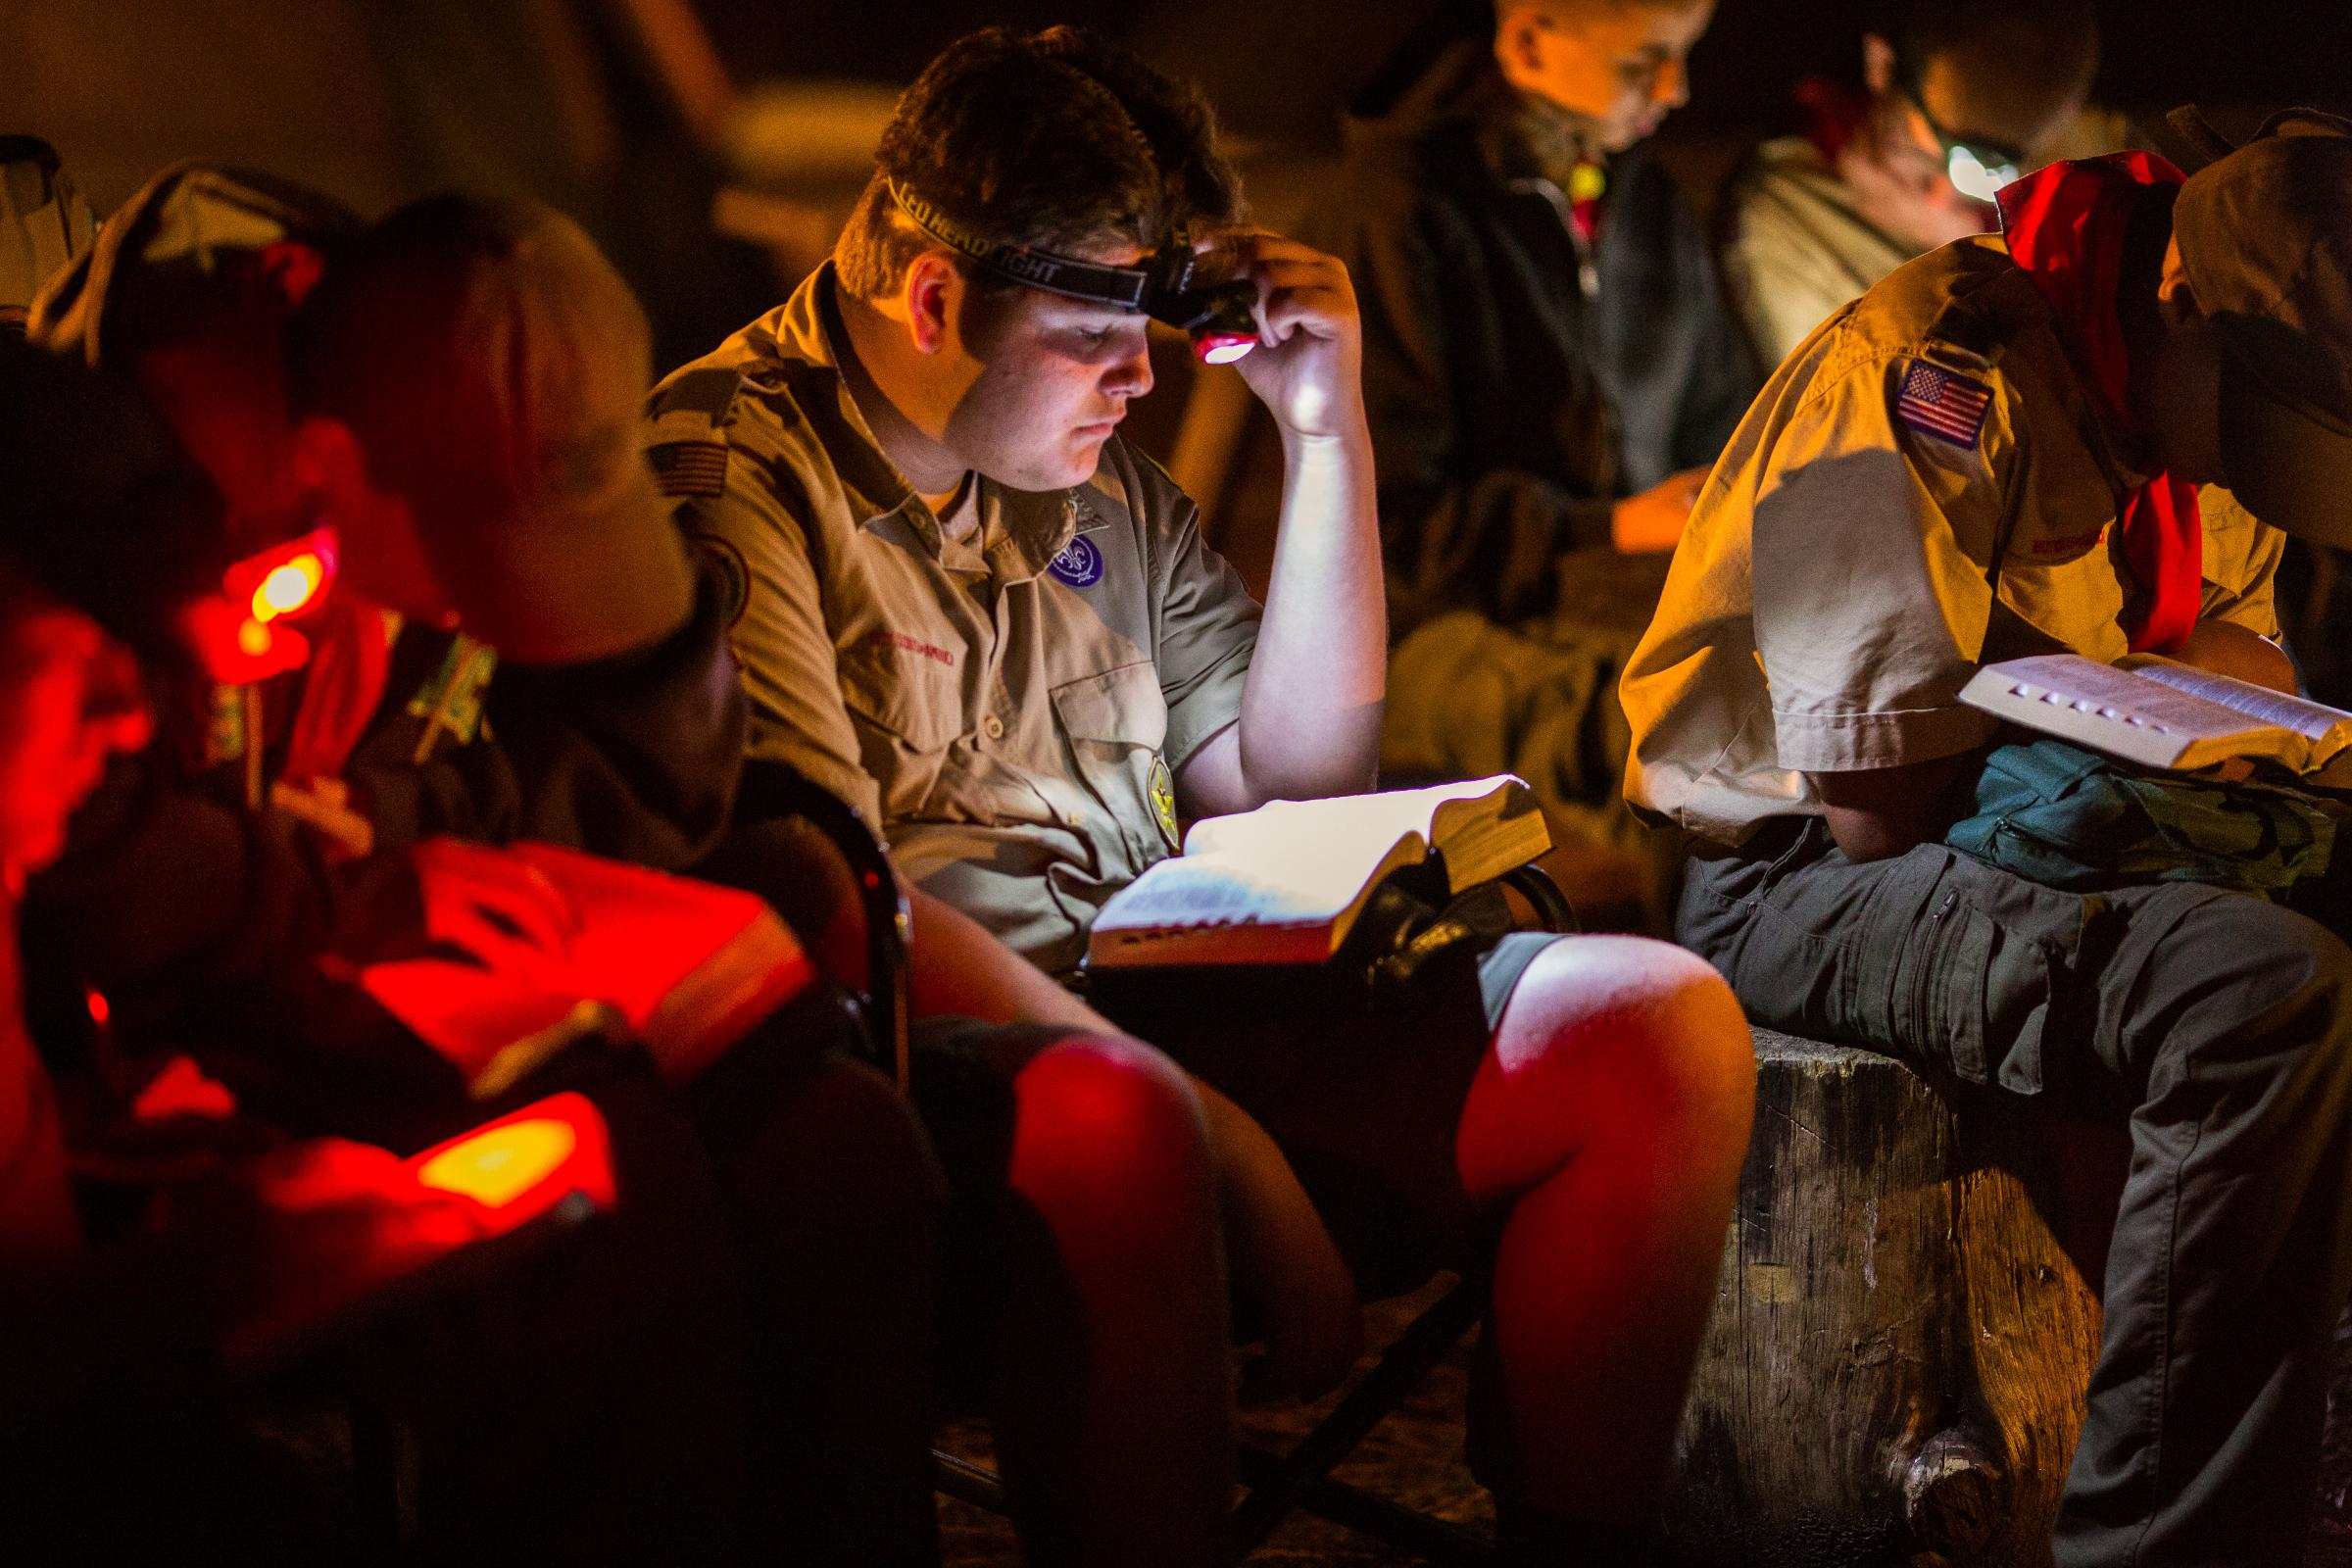 Boy scout essay